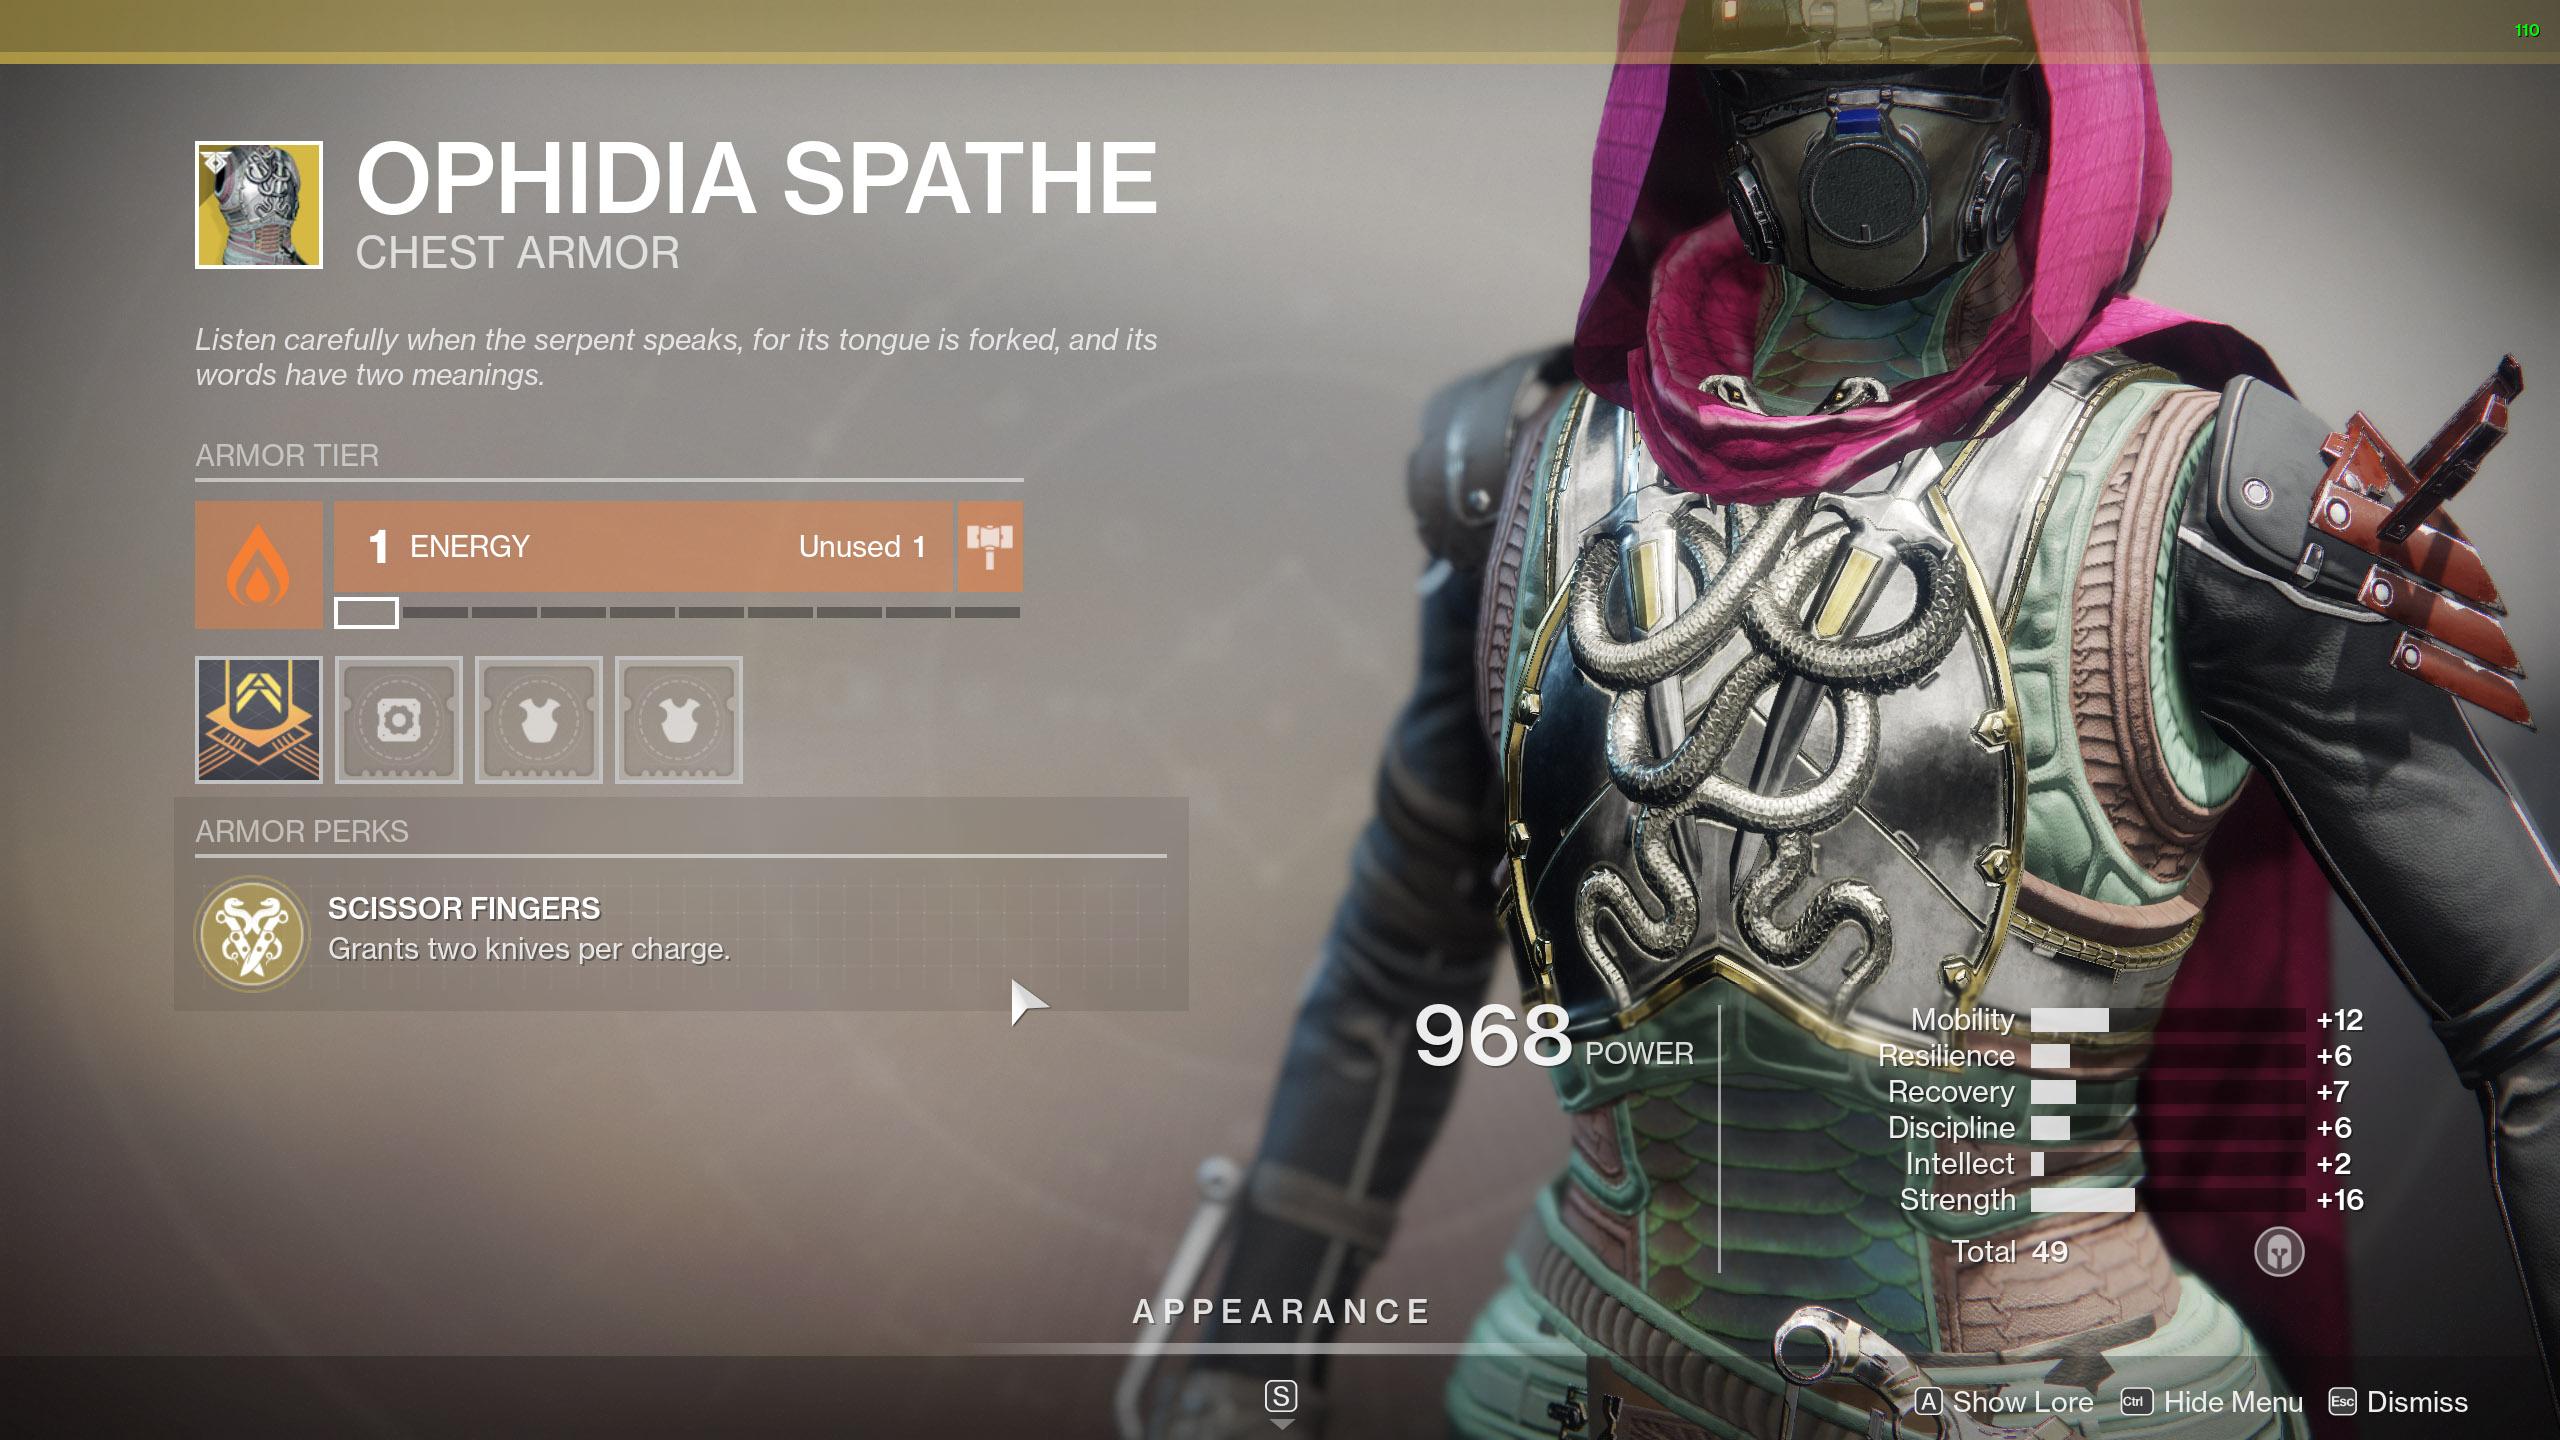 Destiny 2 Exotic Hunter armor Ophidia Spathe